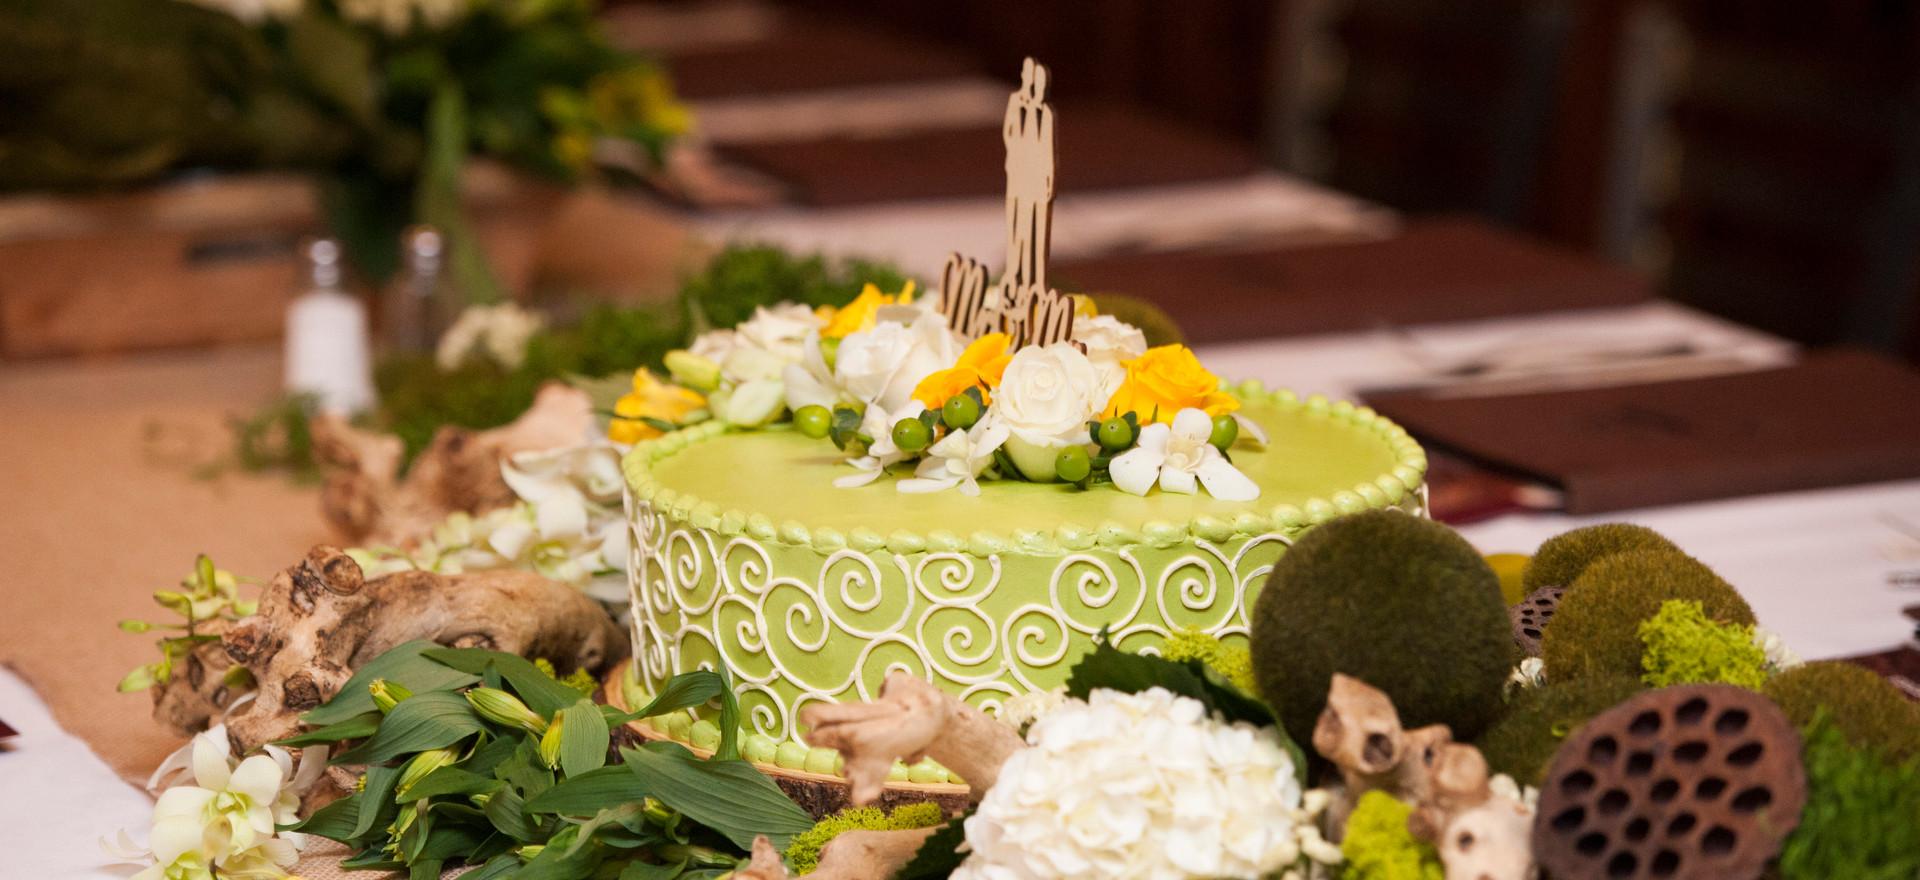 Pretty Park Wedding and Reception